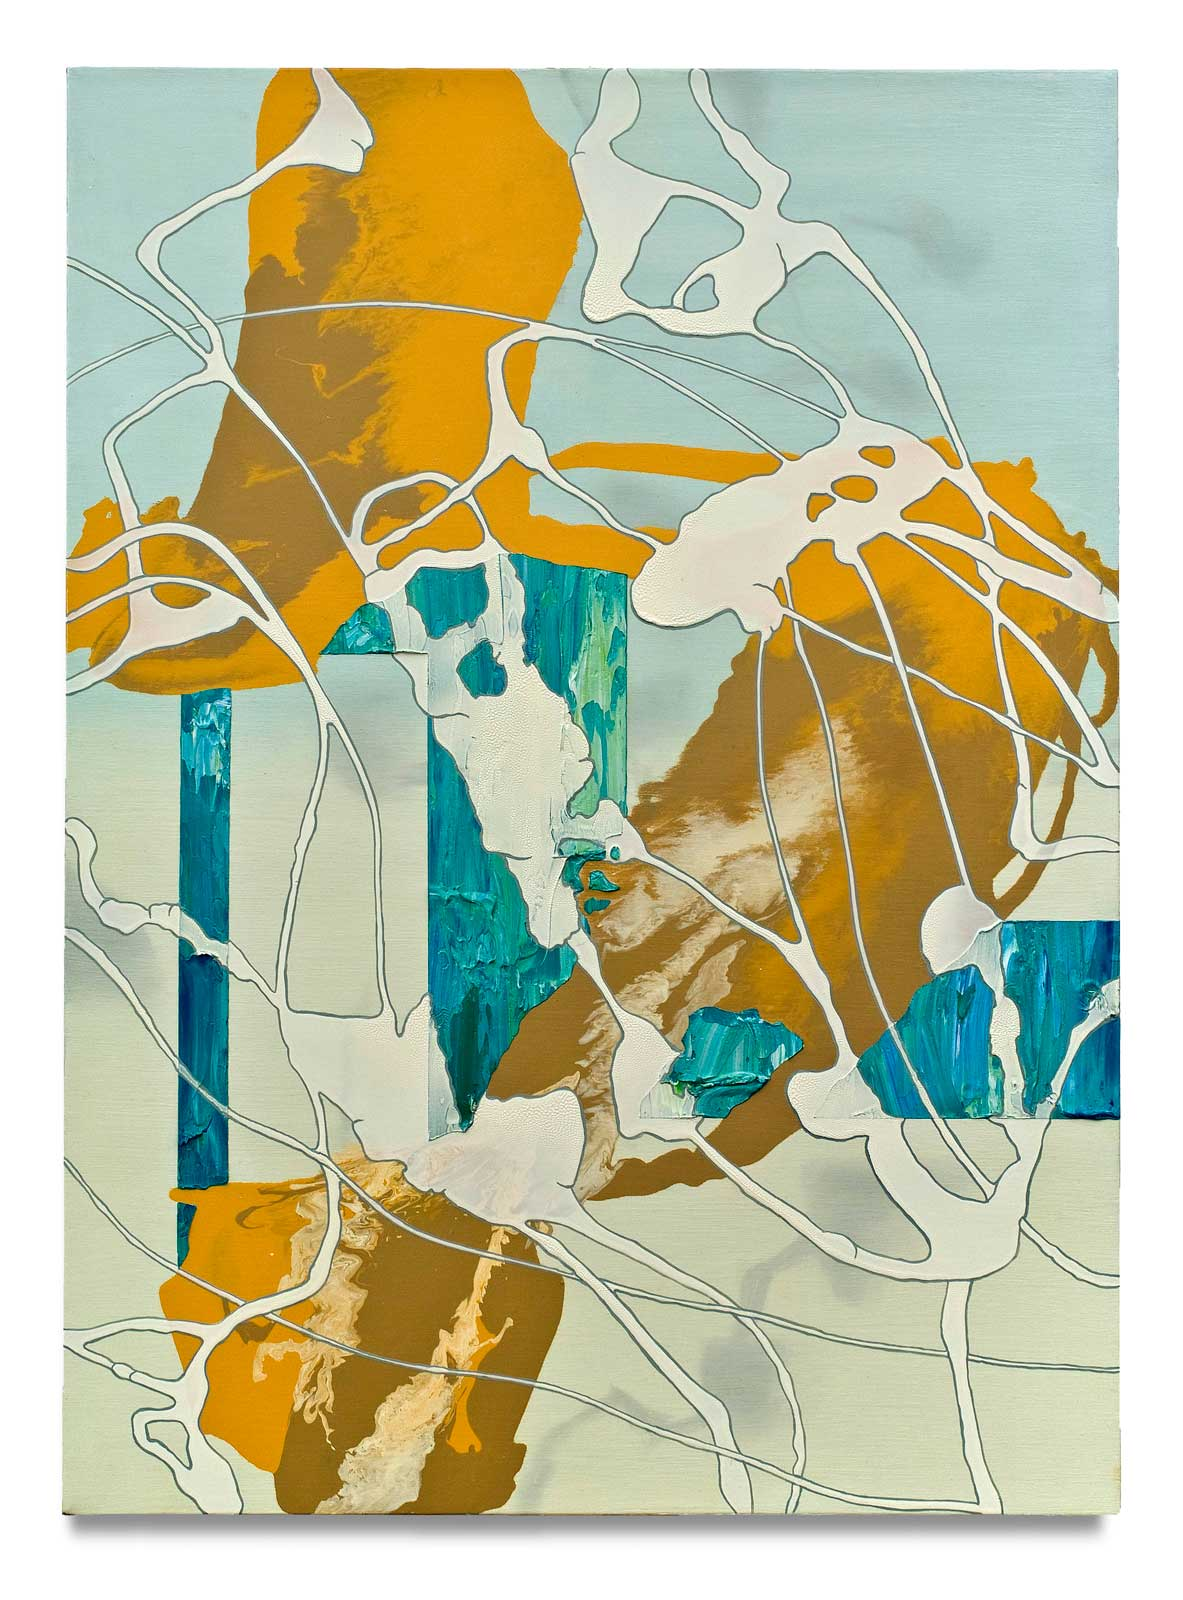 High-Noon-oil-on-canvas-111.76 cm x 81.28 cm.